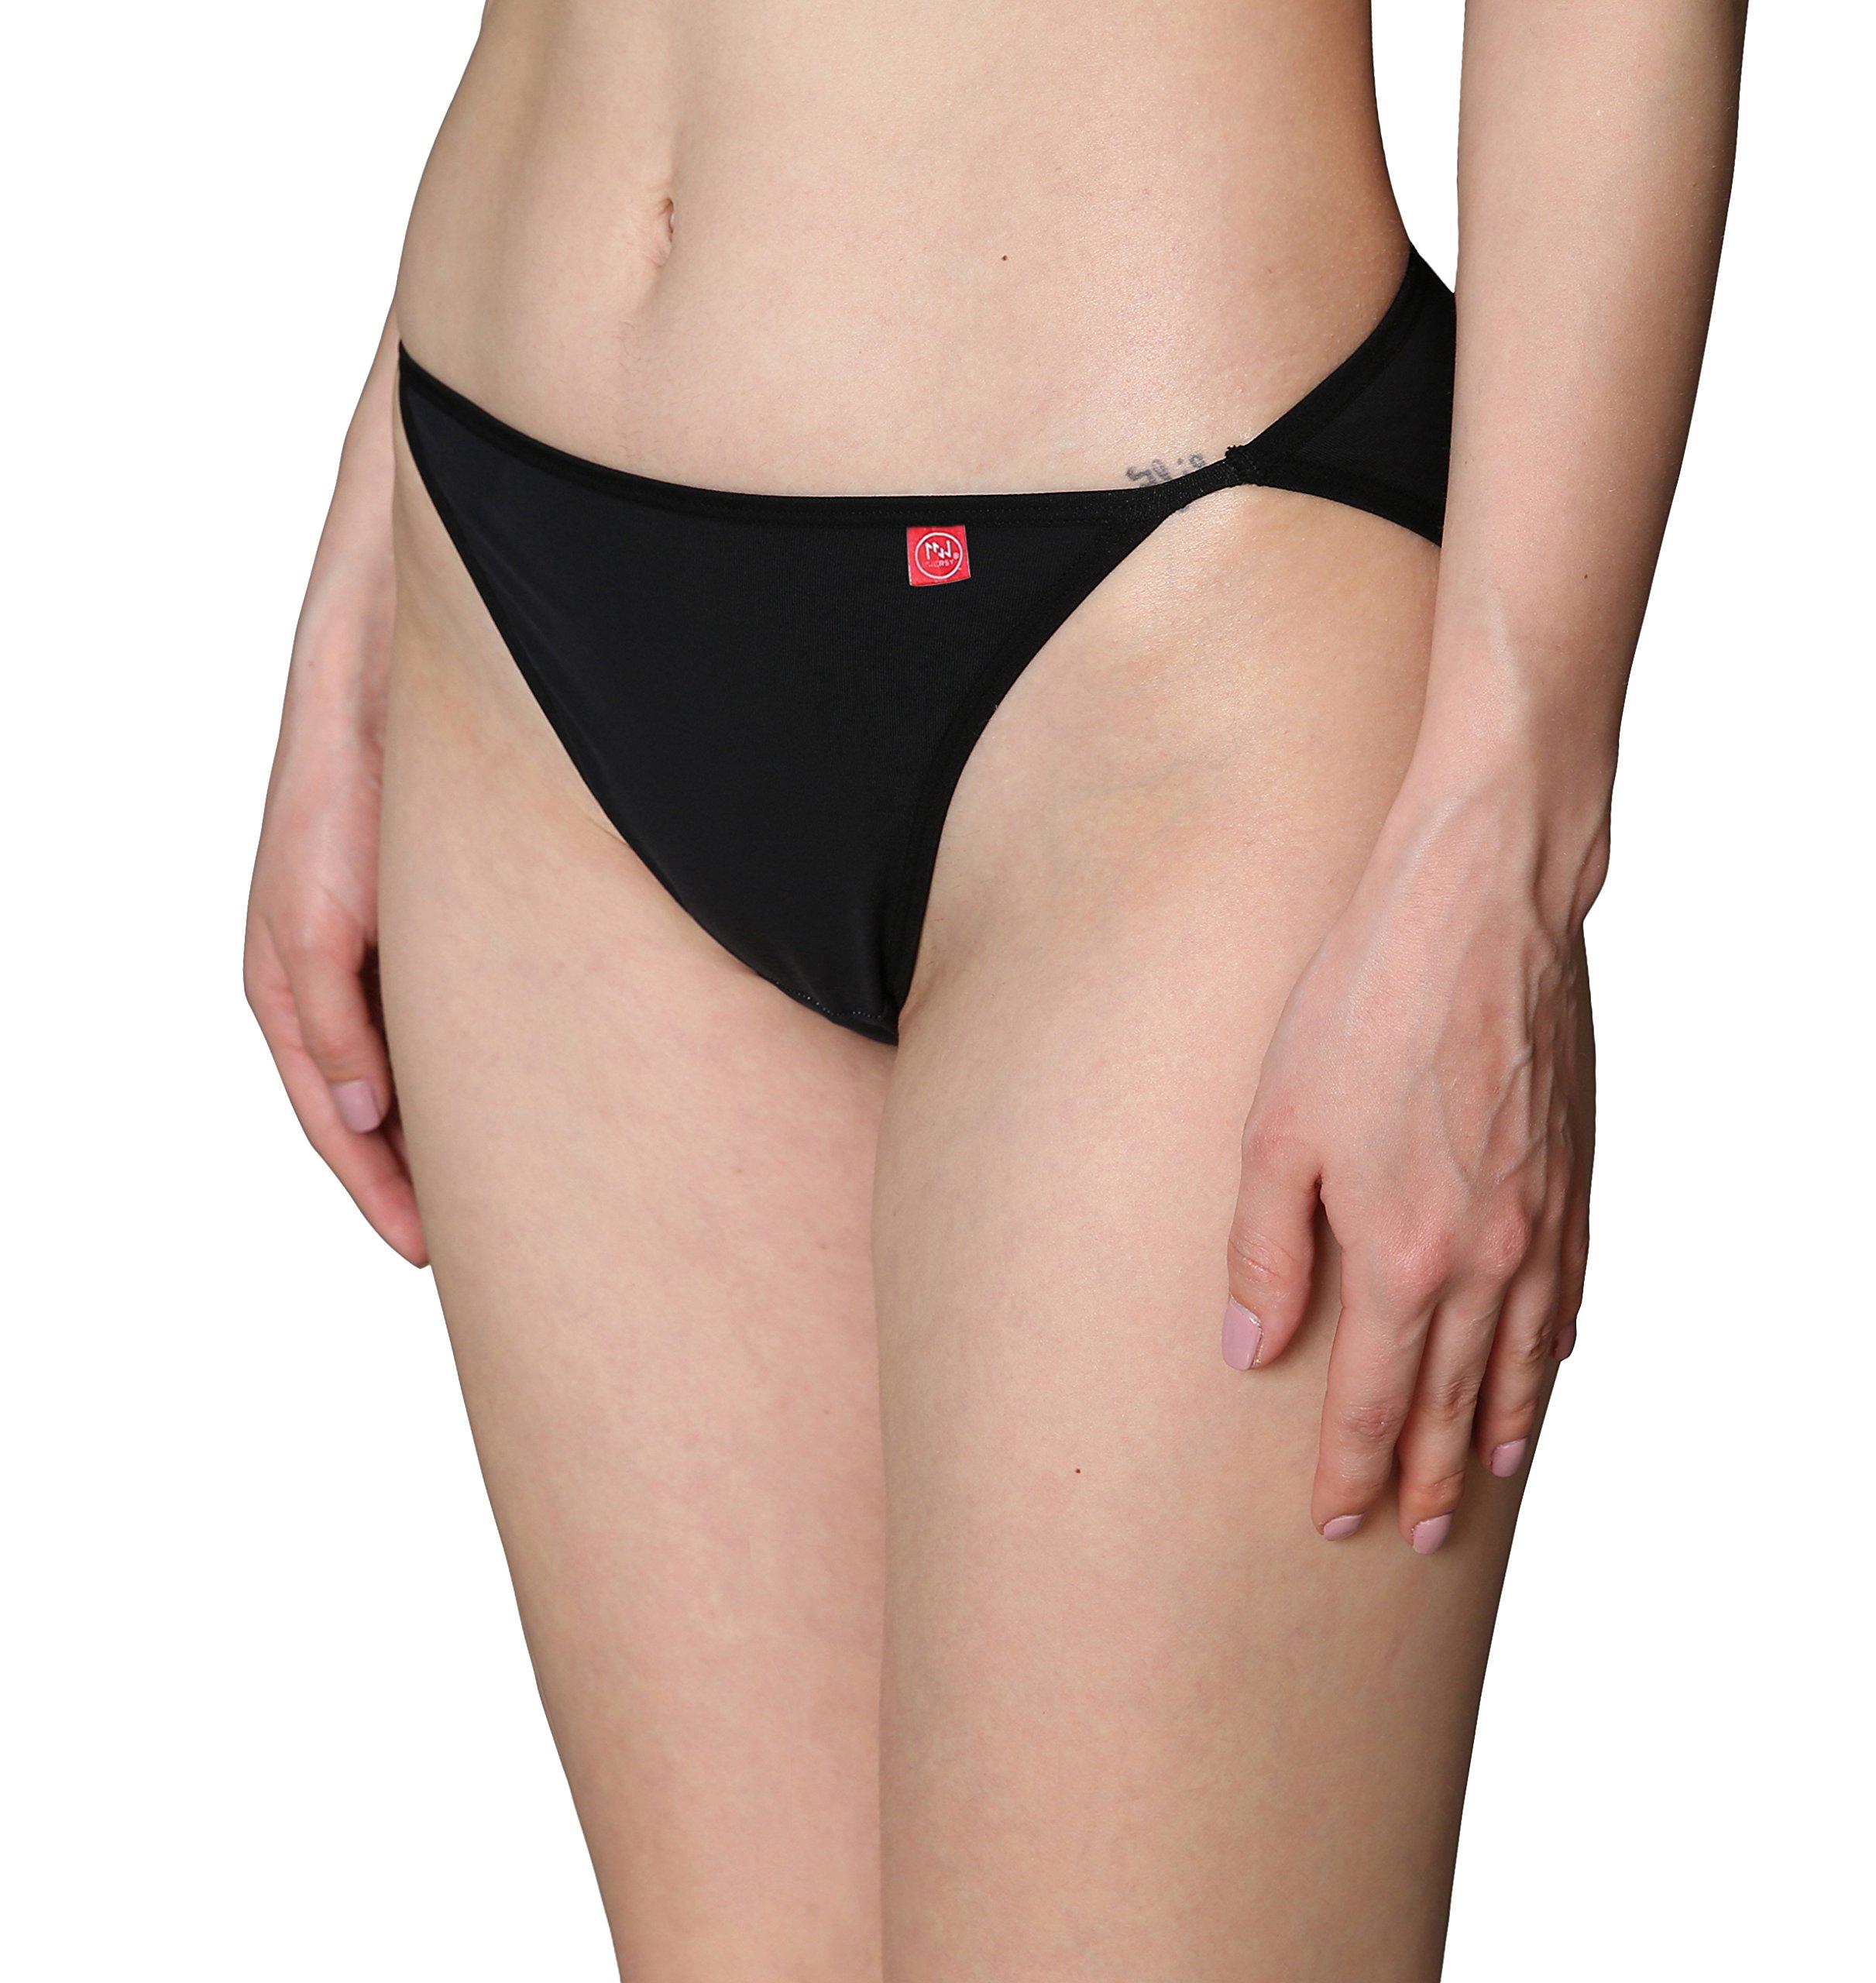 Innersy Women's Underwear Strecth Cotton High-Leg String Bikini Panties (3 Pack) (Large(Waist:30.5''-32''), Light Gray&Ensign&Black)